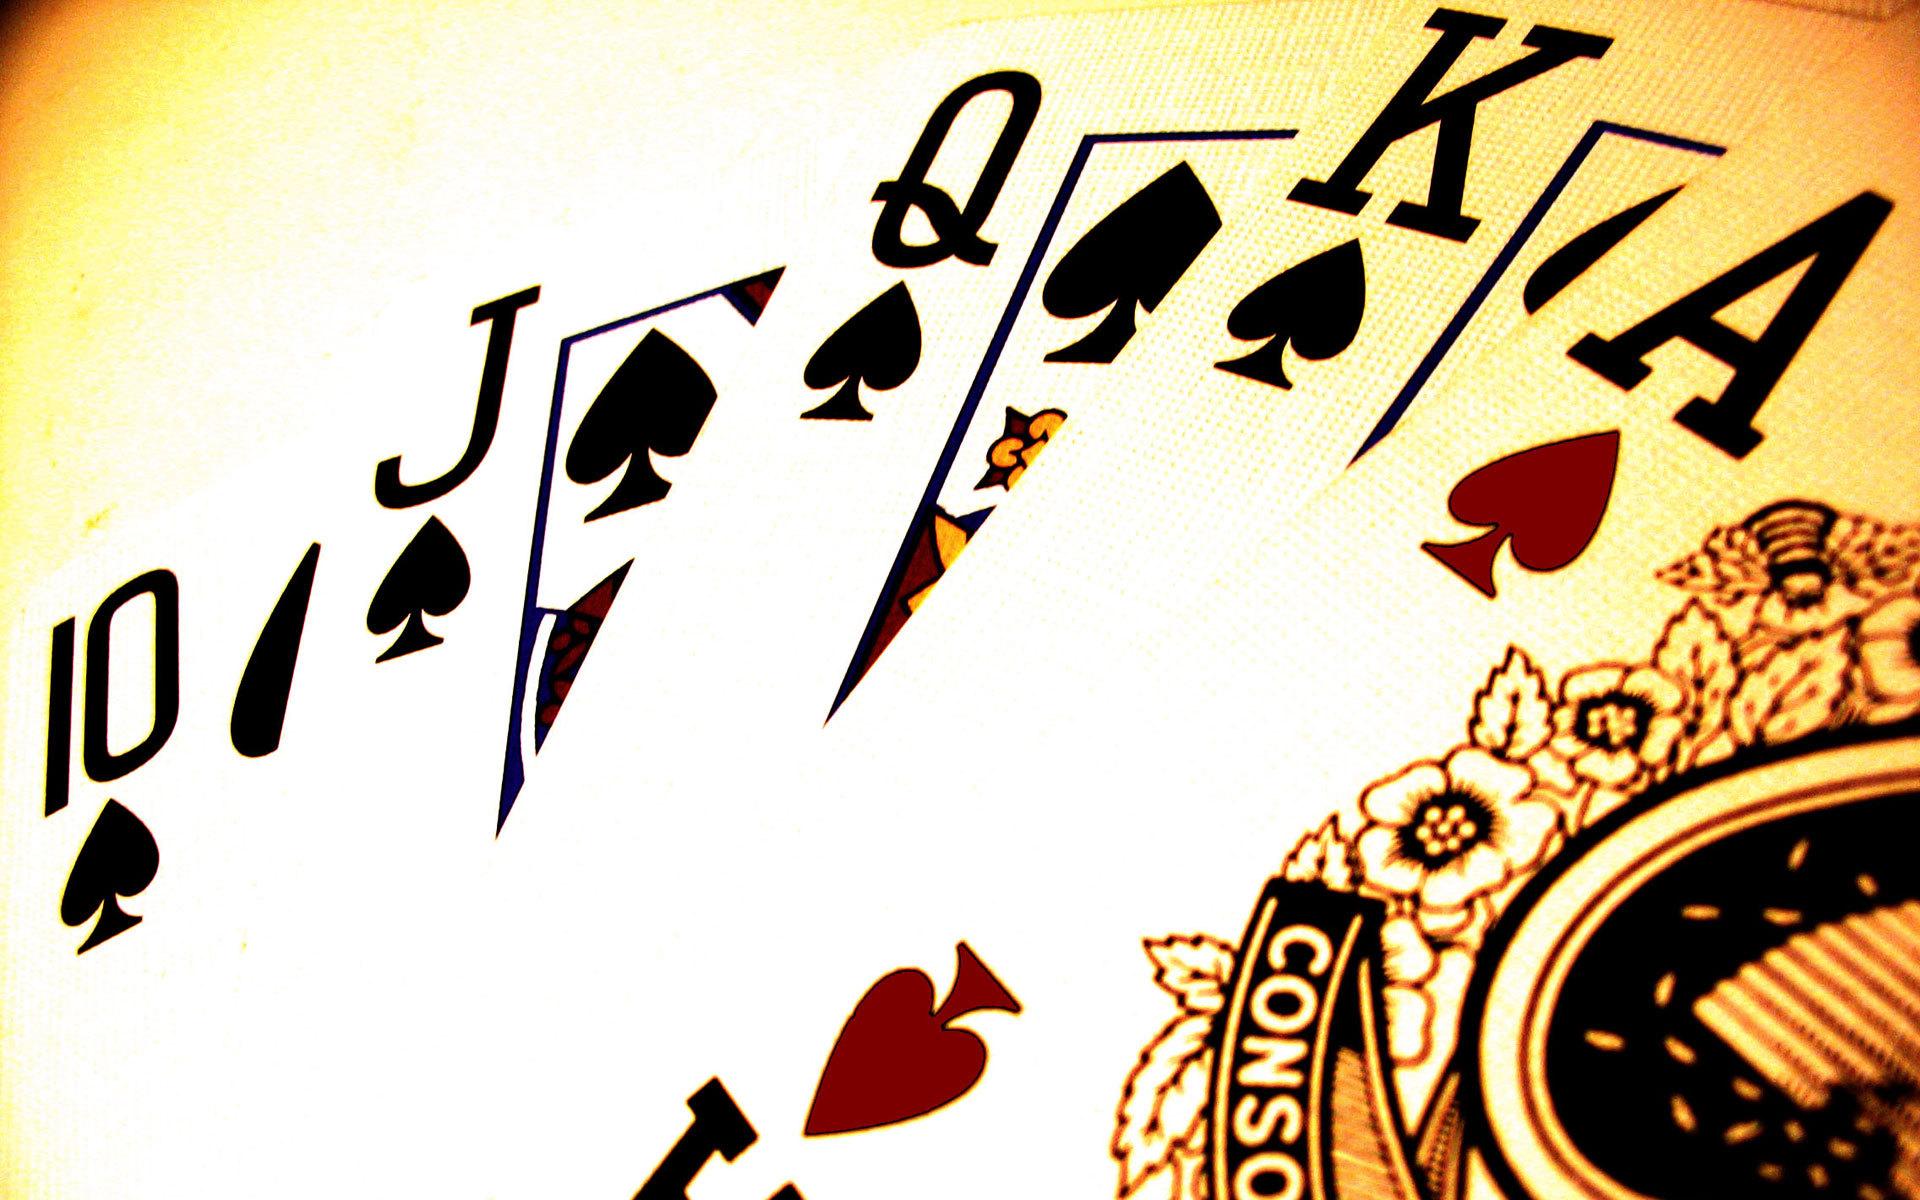 карты, покер, роял флеш